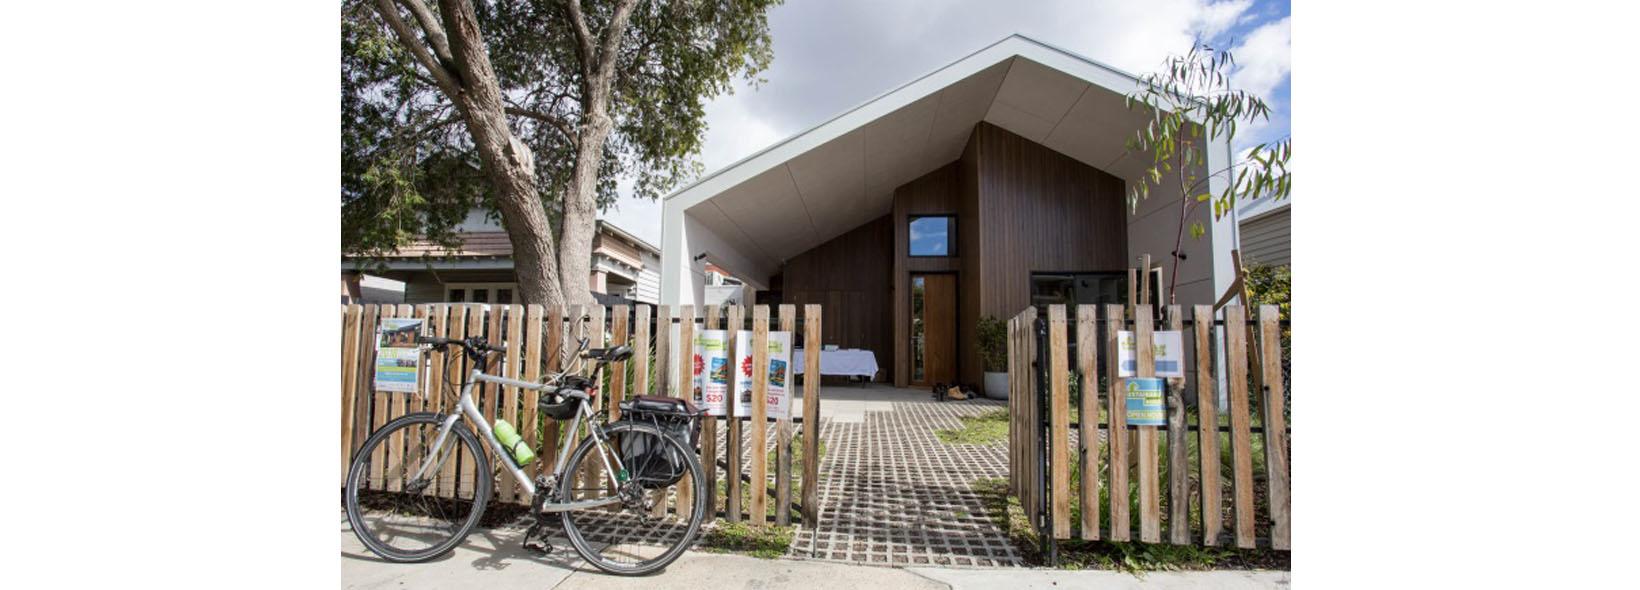 House design-build-performance monitor forum